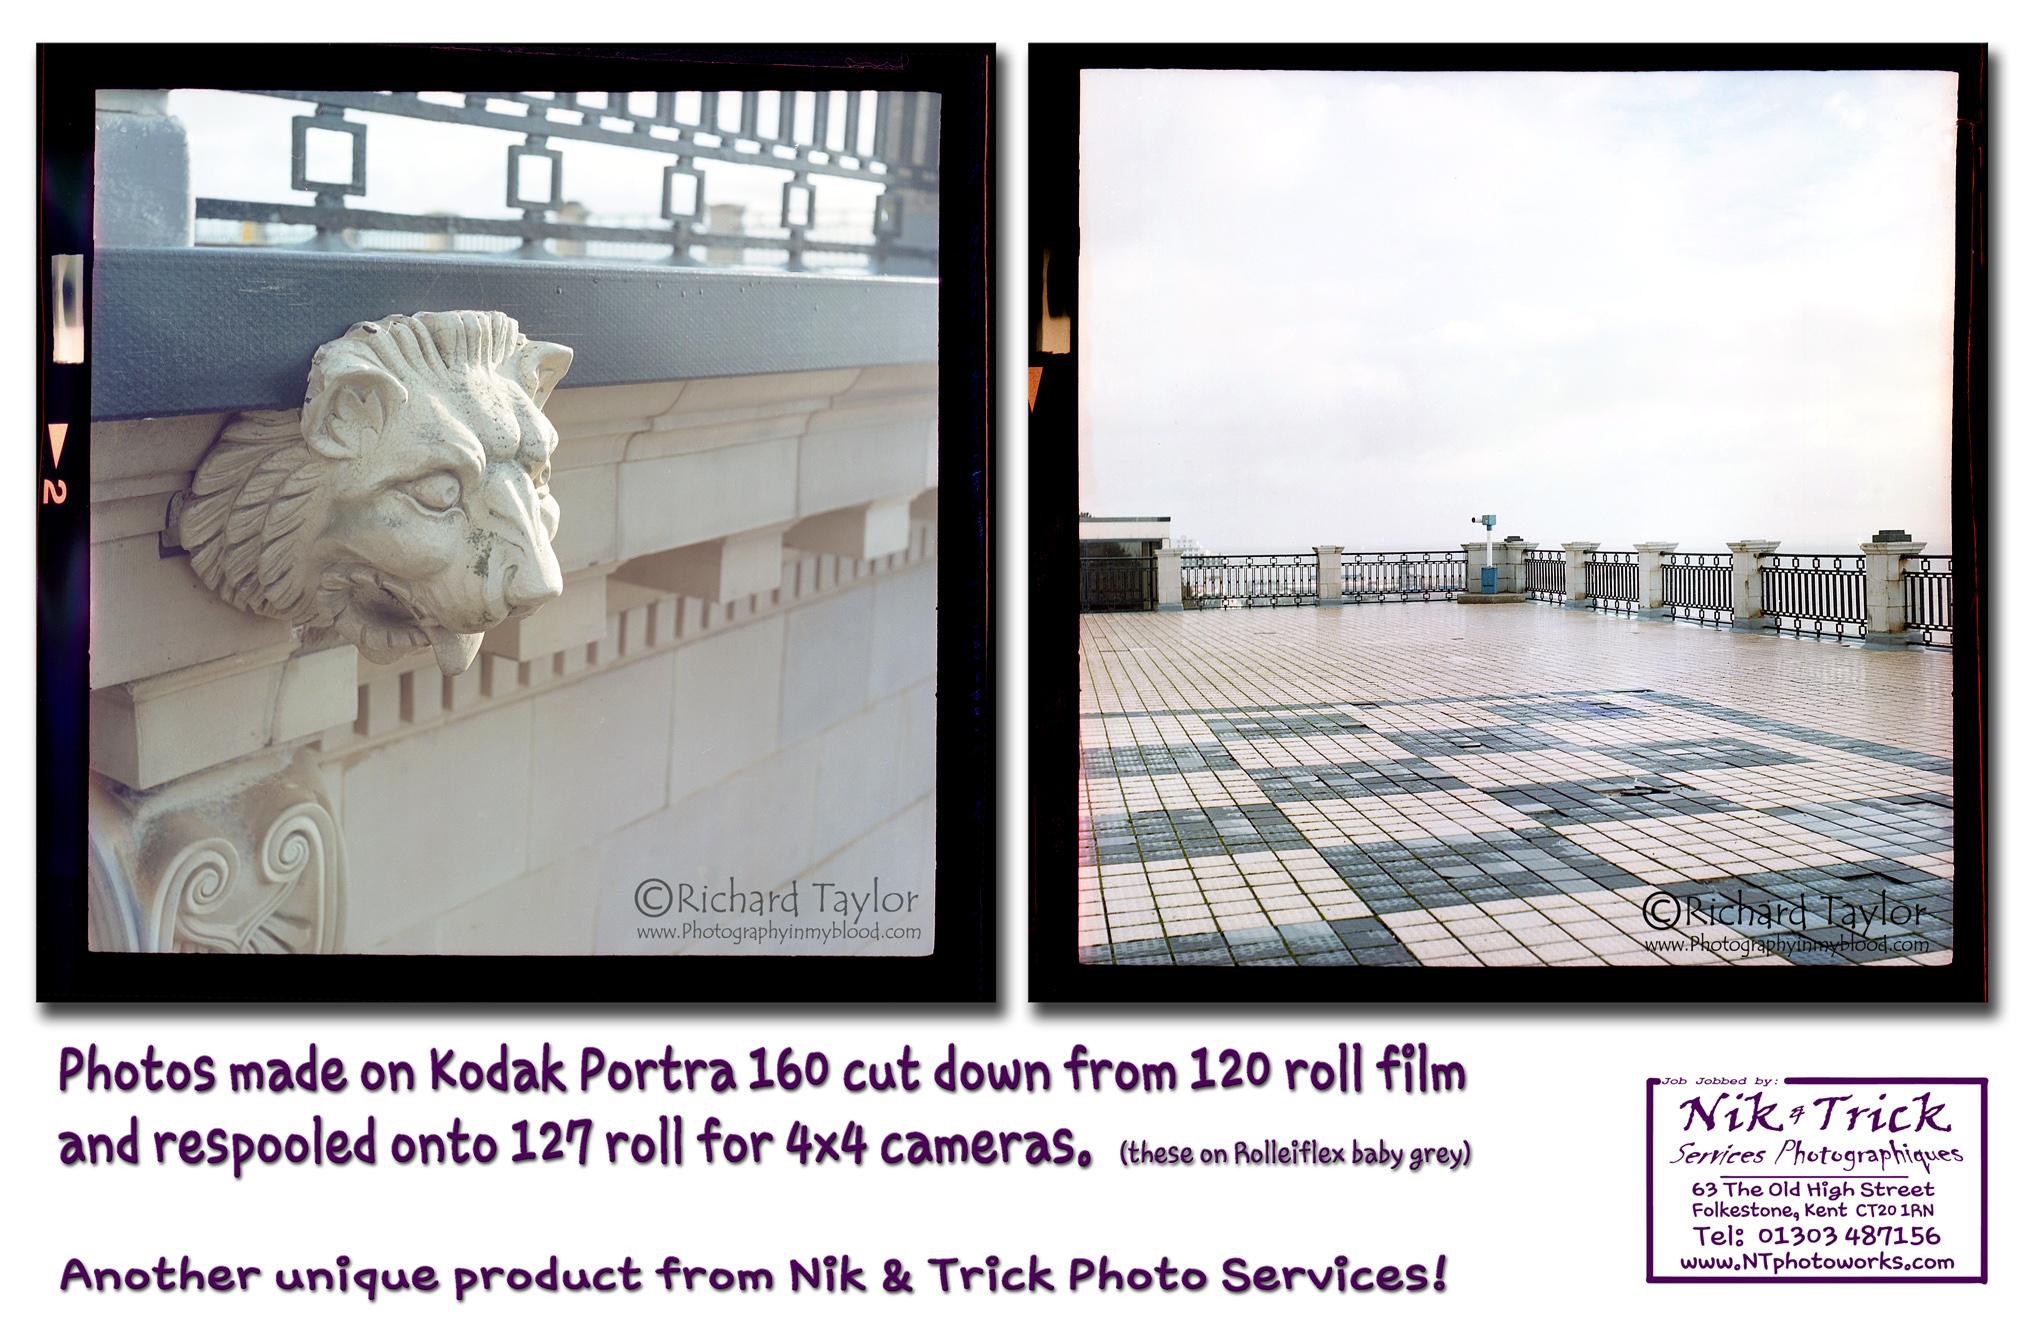 127 roll film – Nik & Trick Photo Services